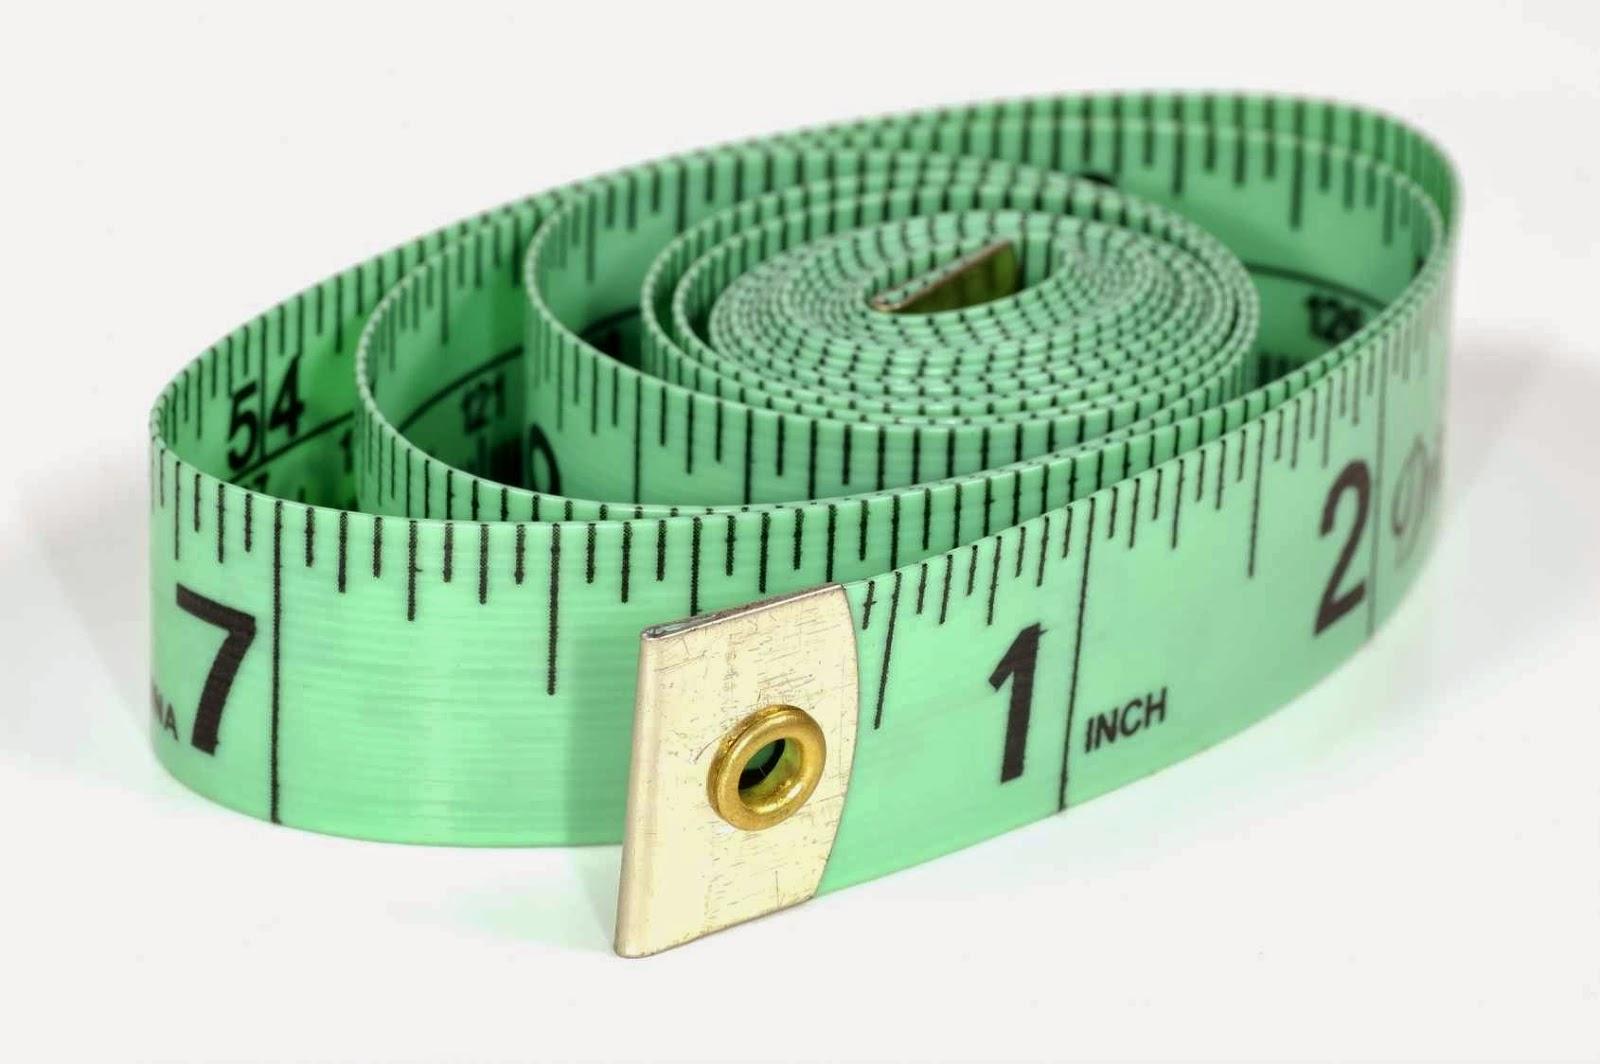 http://2.bp.blogspot.com/-M79EVo9u27g/VK7UATLRgEI/AAAAAAAADes/tux_-D_0sTk/s1600/tape-measure.jpg